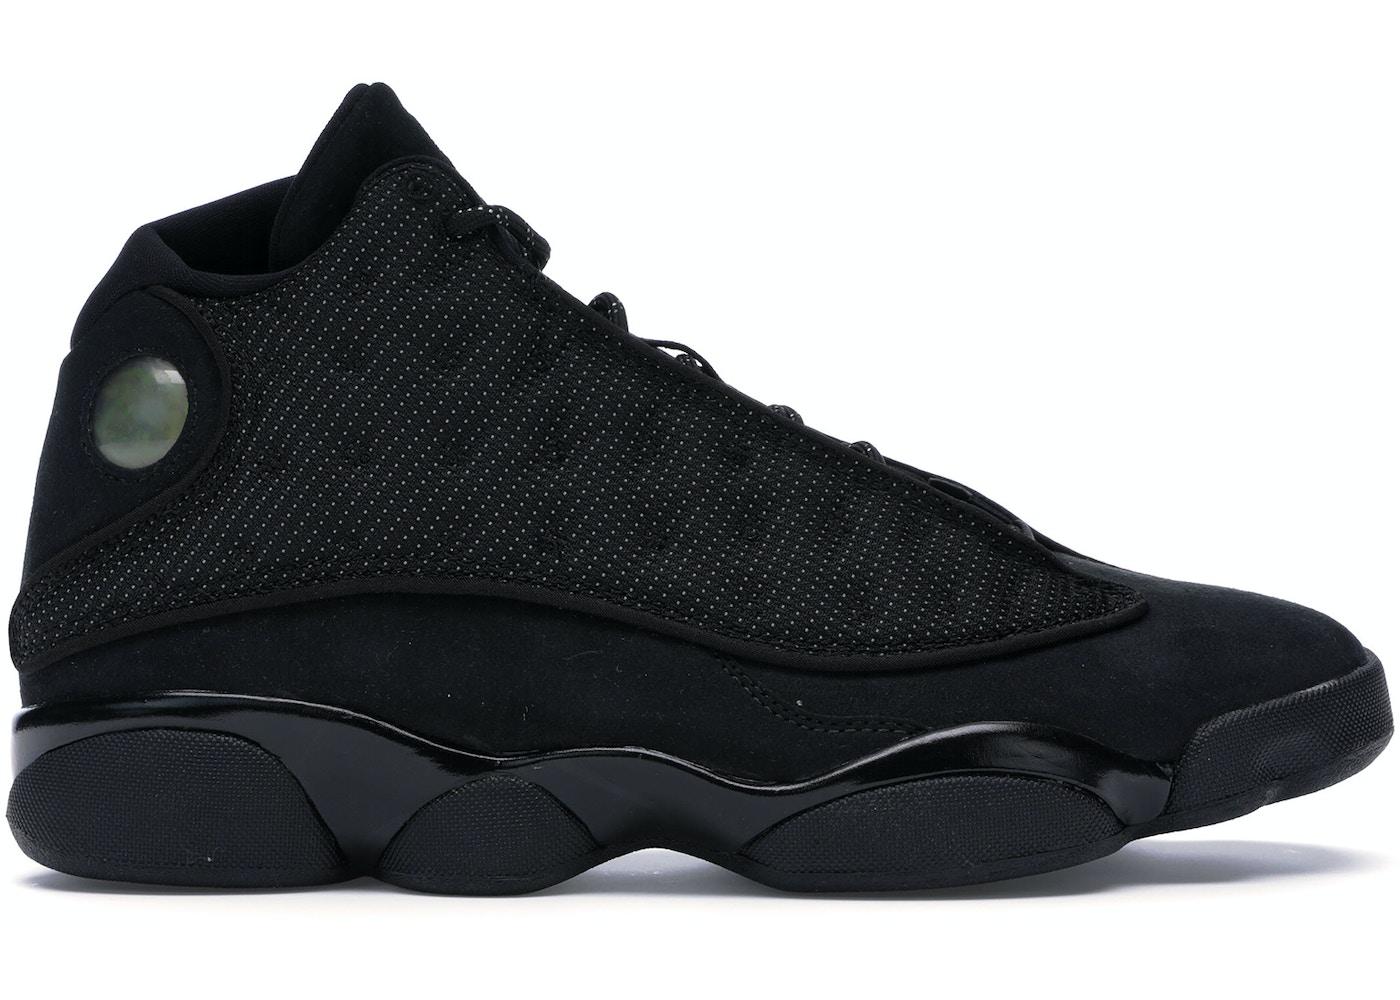 big sale 3a337 334ec Buy Air Jordan 13 Size 7 Shoes & Deadstock Sneakers